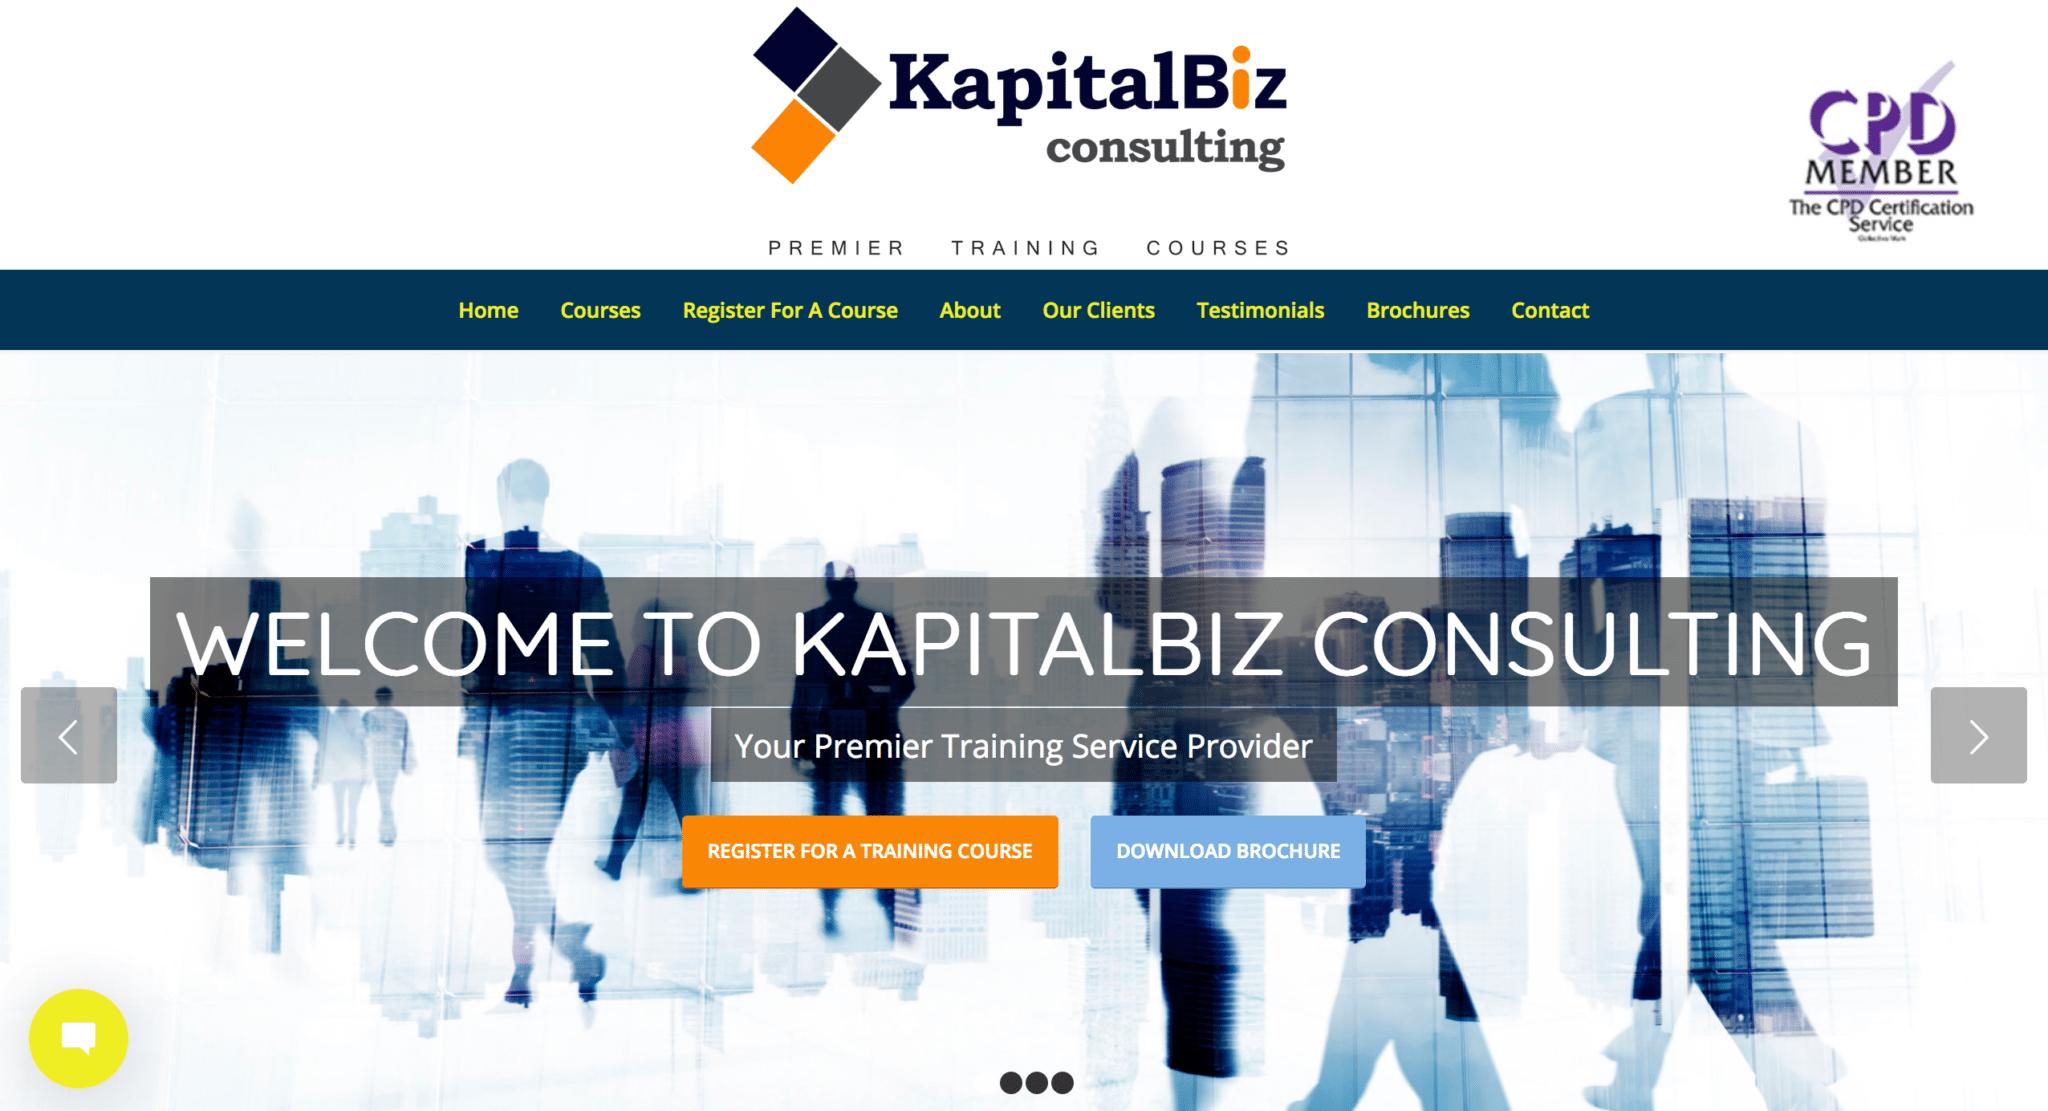 KapitalBiz-Consultant